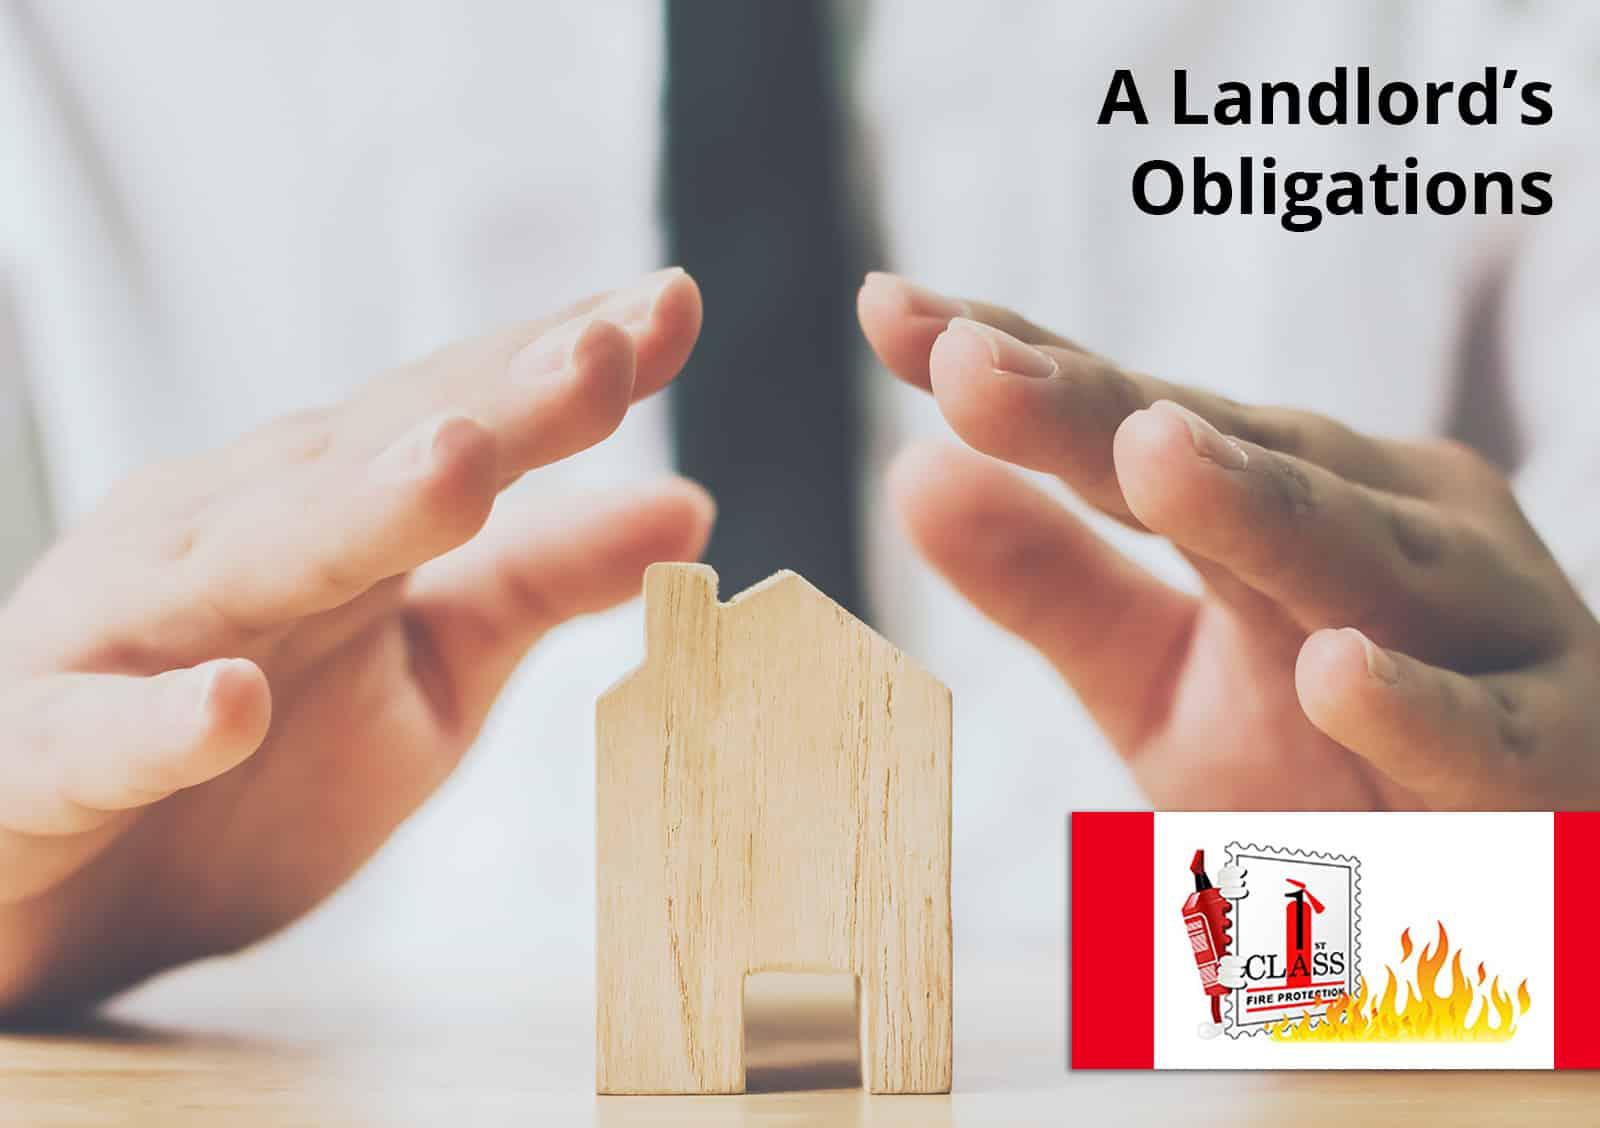 Landlords Fire Risk Assessment Obligations